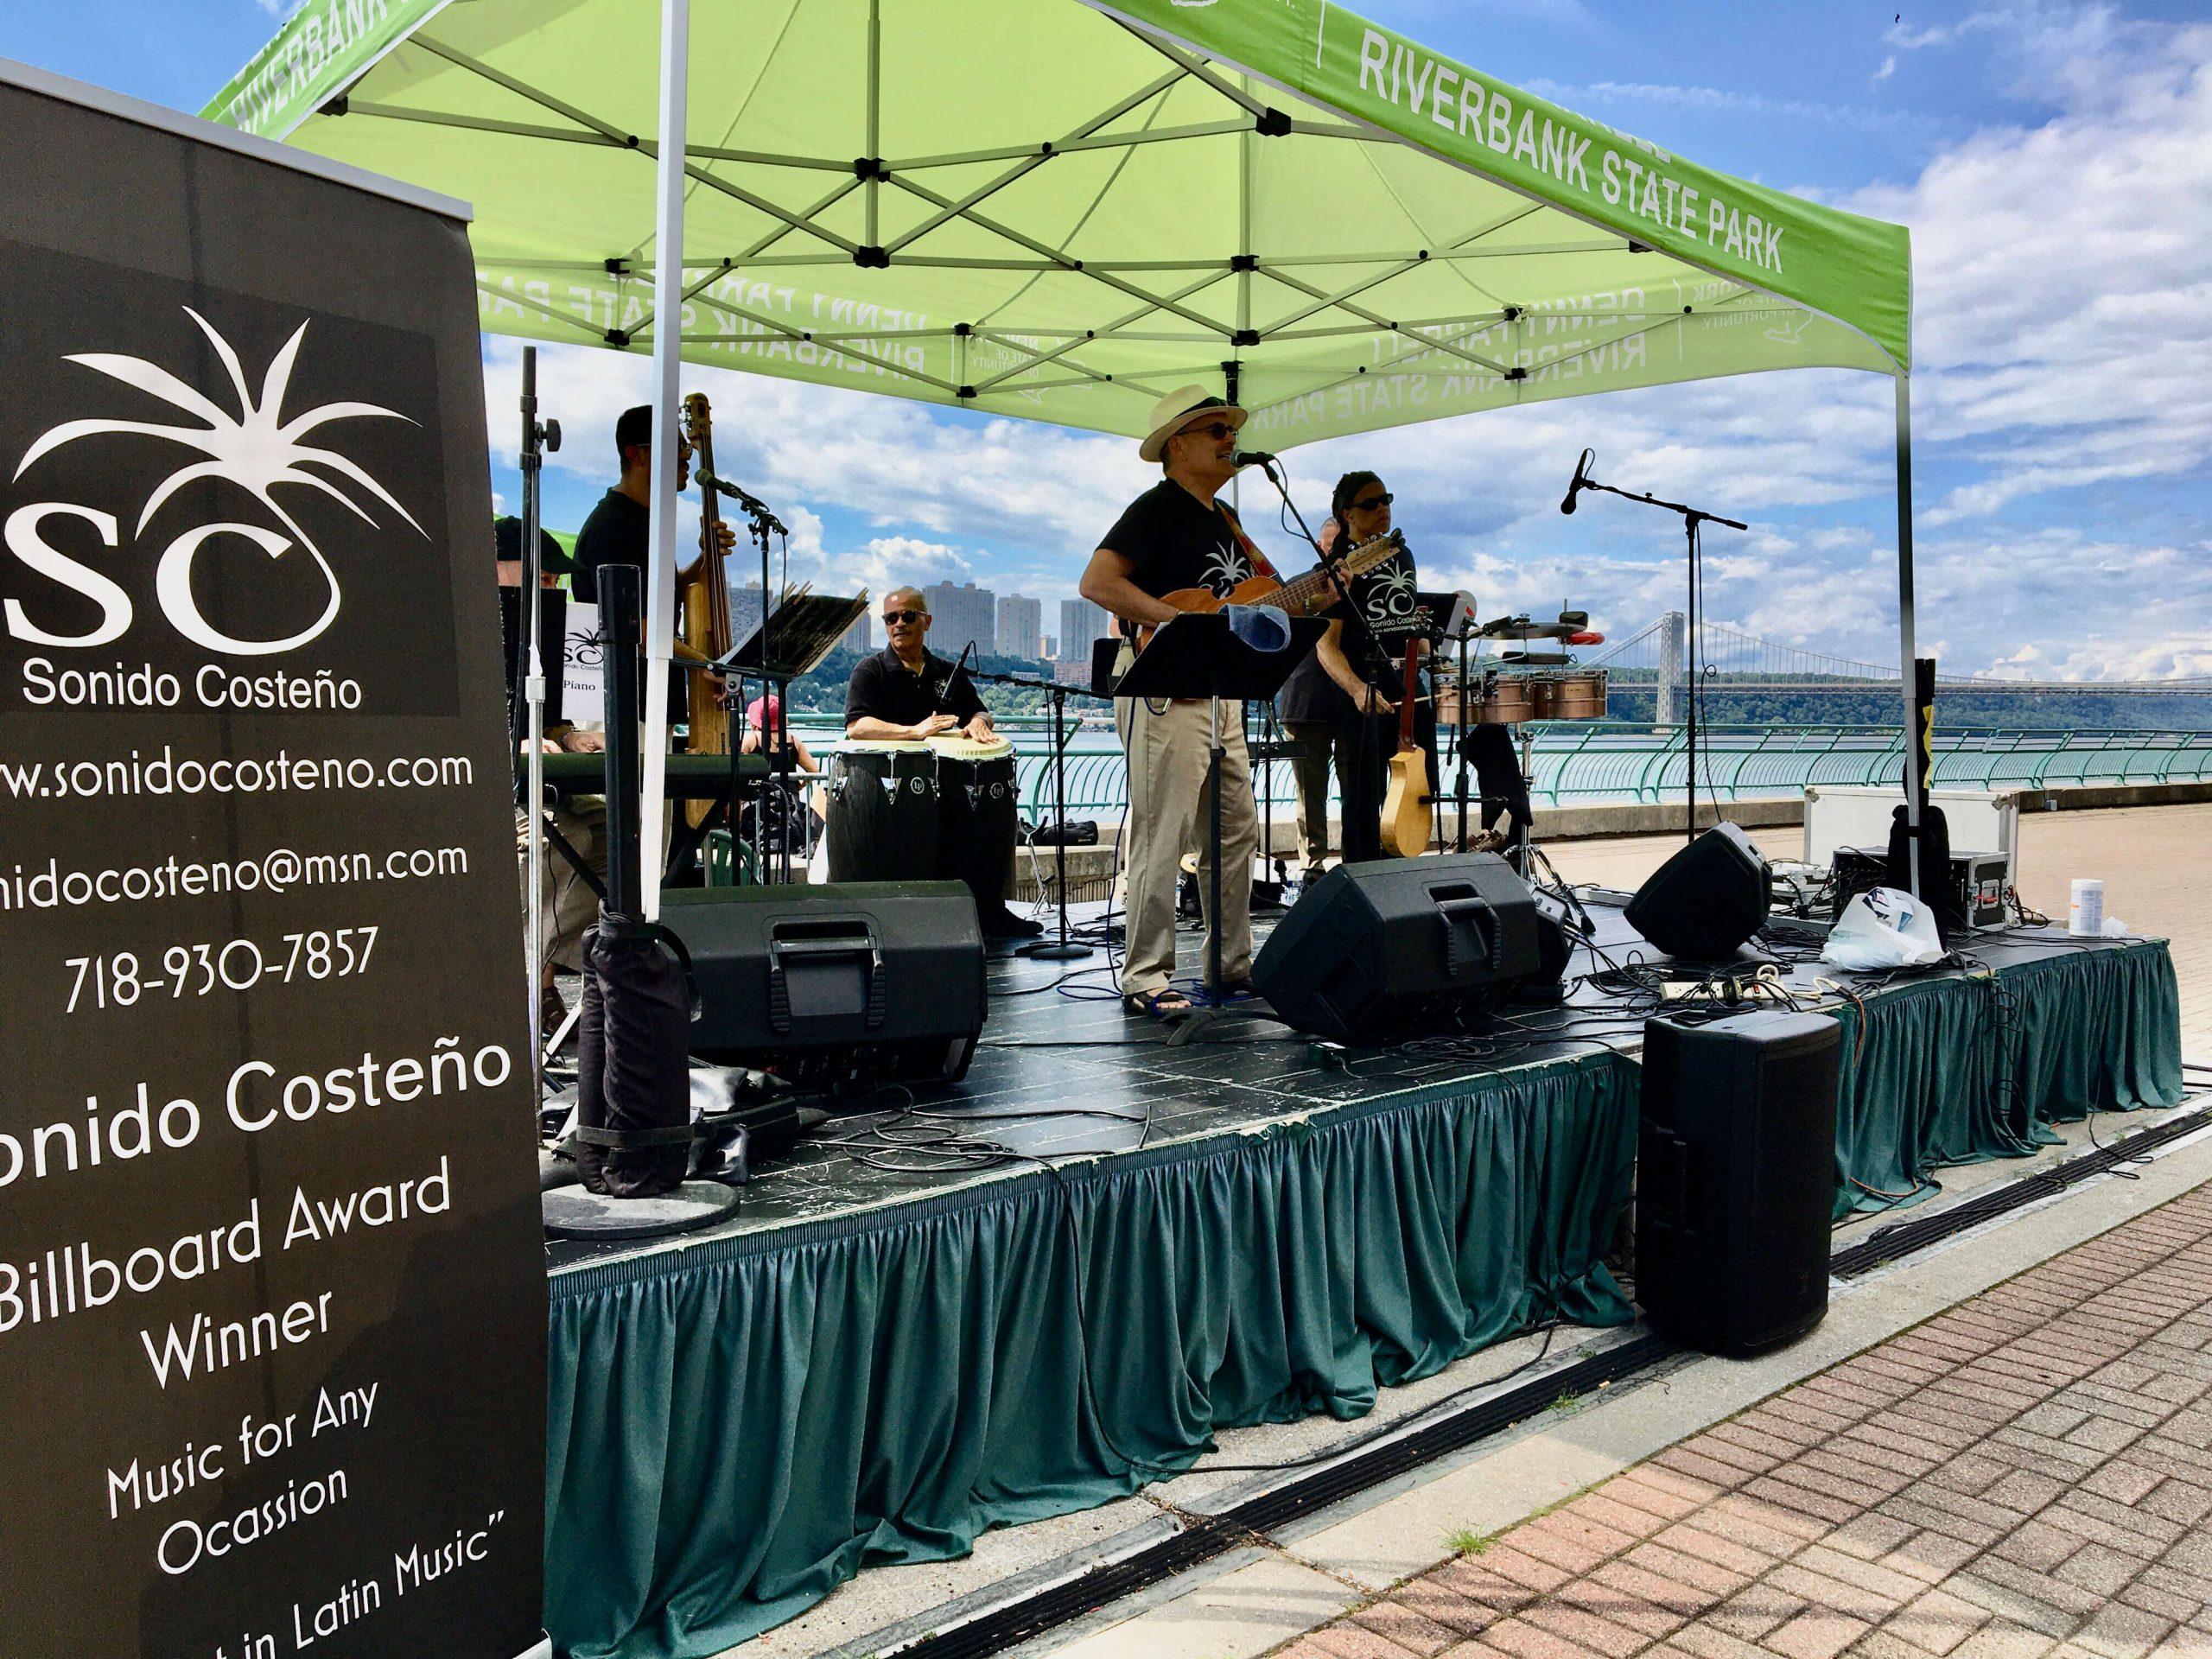 Sonido Costeno playing at Riverbank State Park